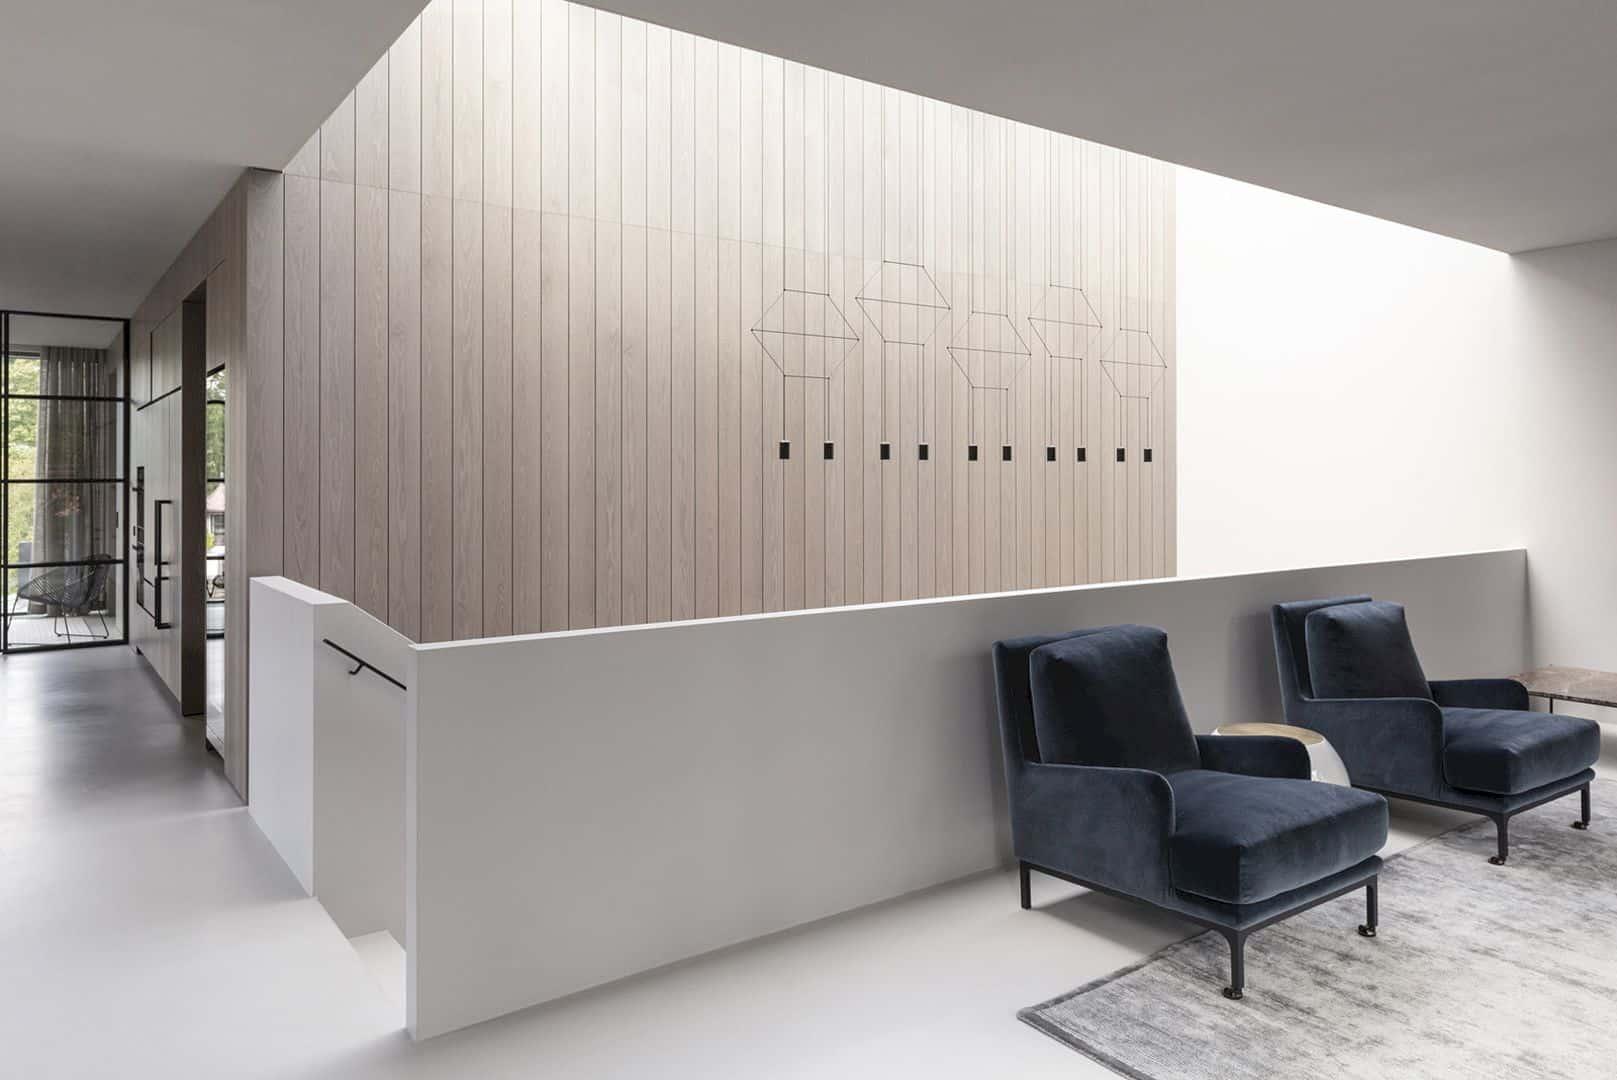 Matchbox Houses By Avanto Architects 2